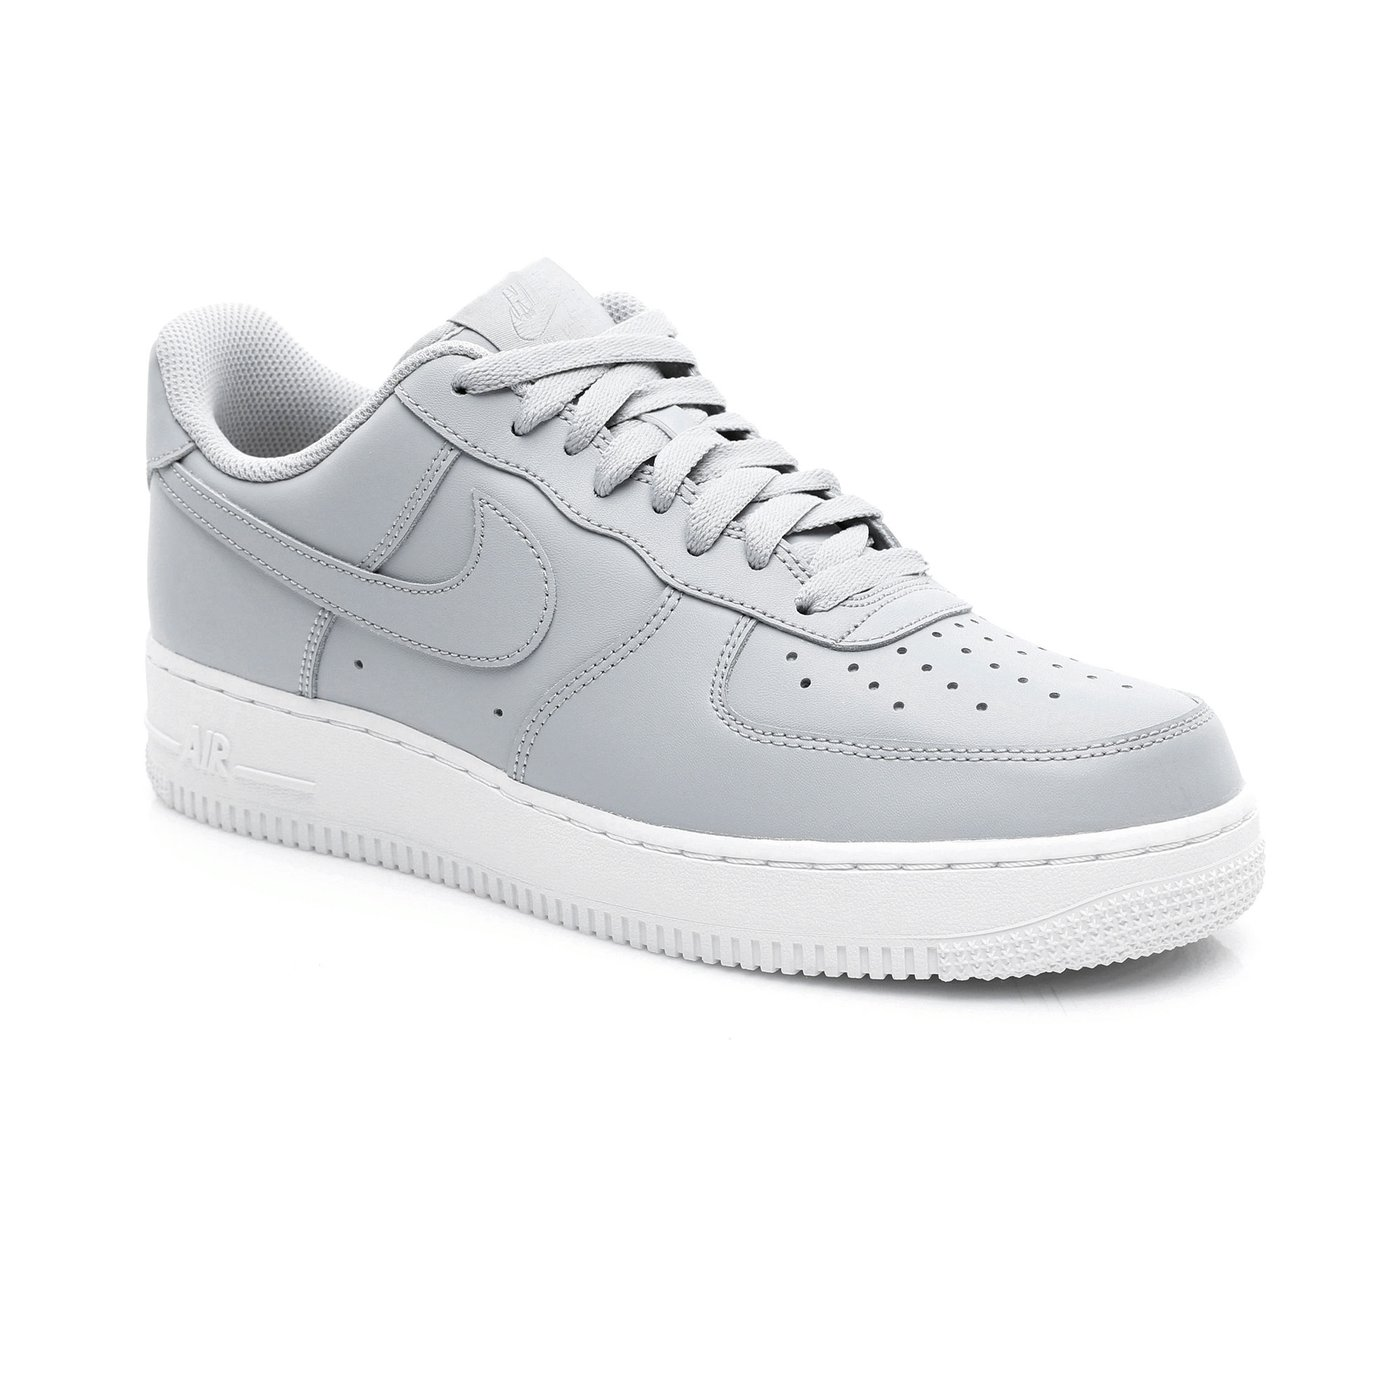 Nike Air Force 1 '07 Erkek Gri Spor Ayakkabı